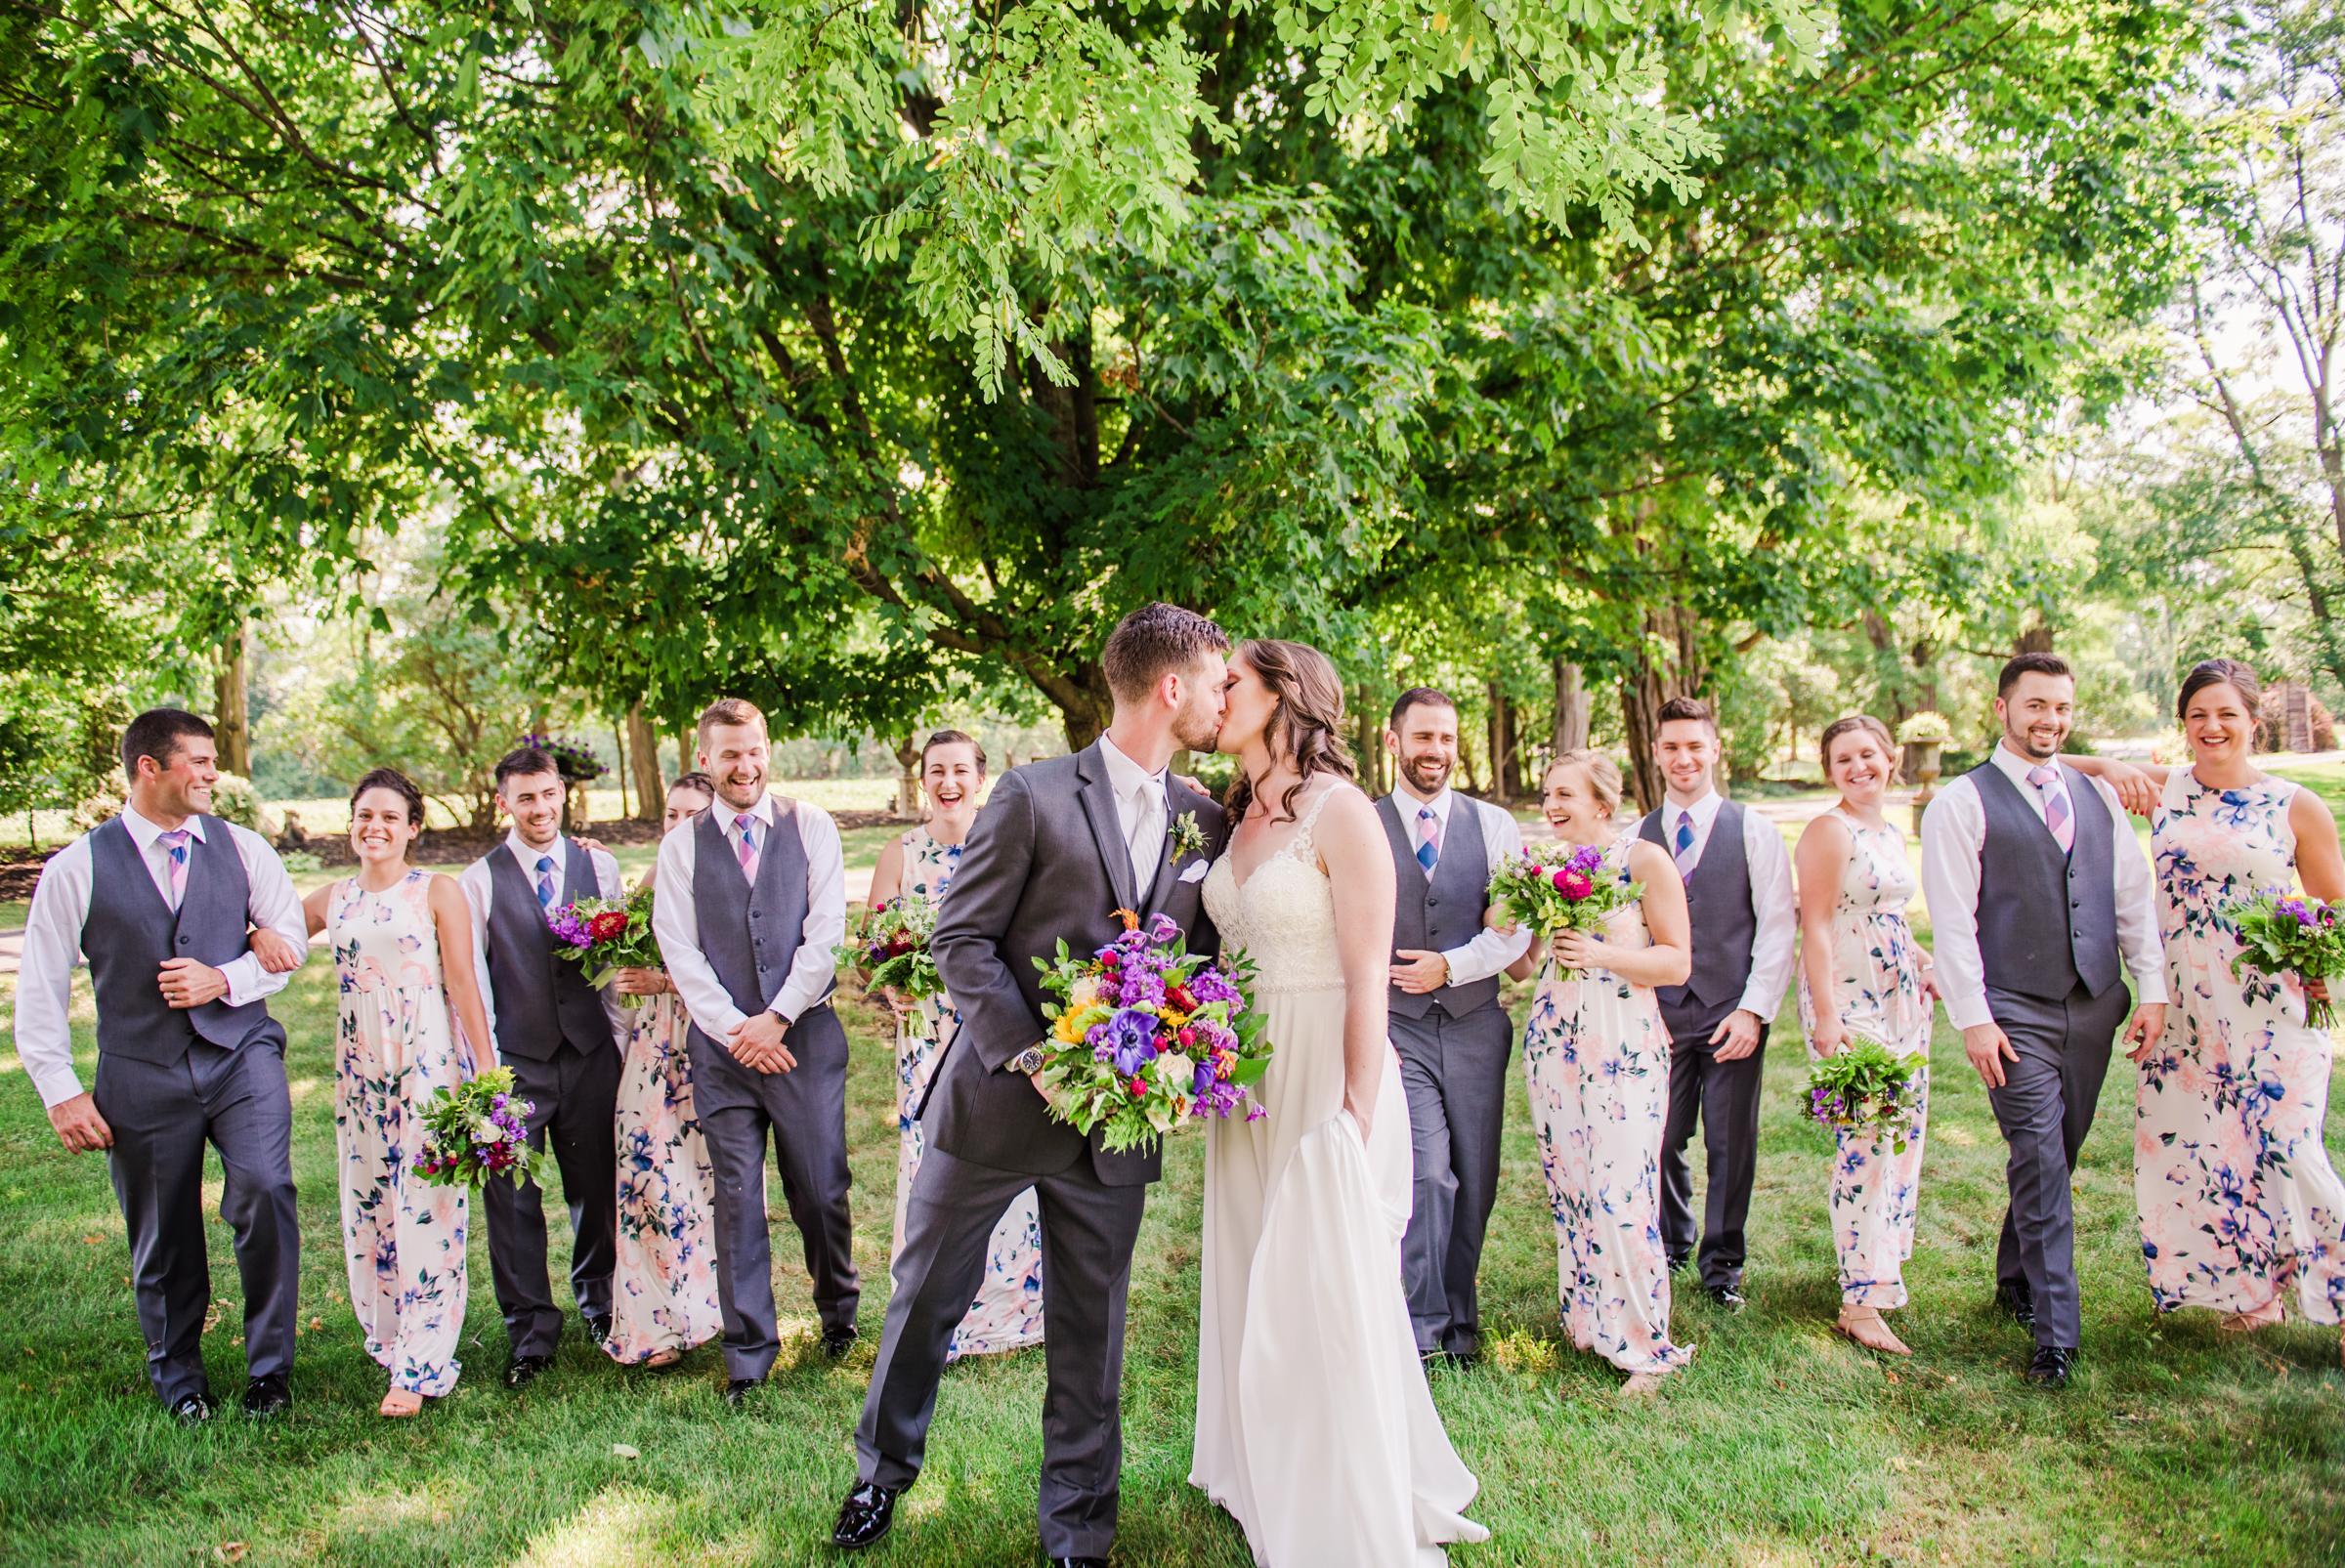 Jerris_Wadsworth_Wedding_Barn_Rochester_Wedding_JILL_STUDIO_Rochester_NY_Photographer_DSC_2403.jpg